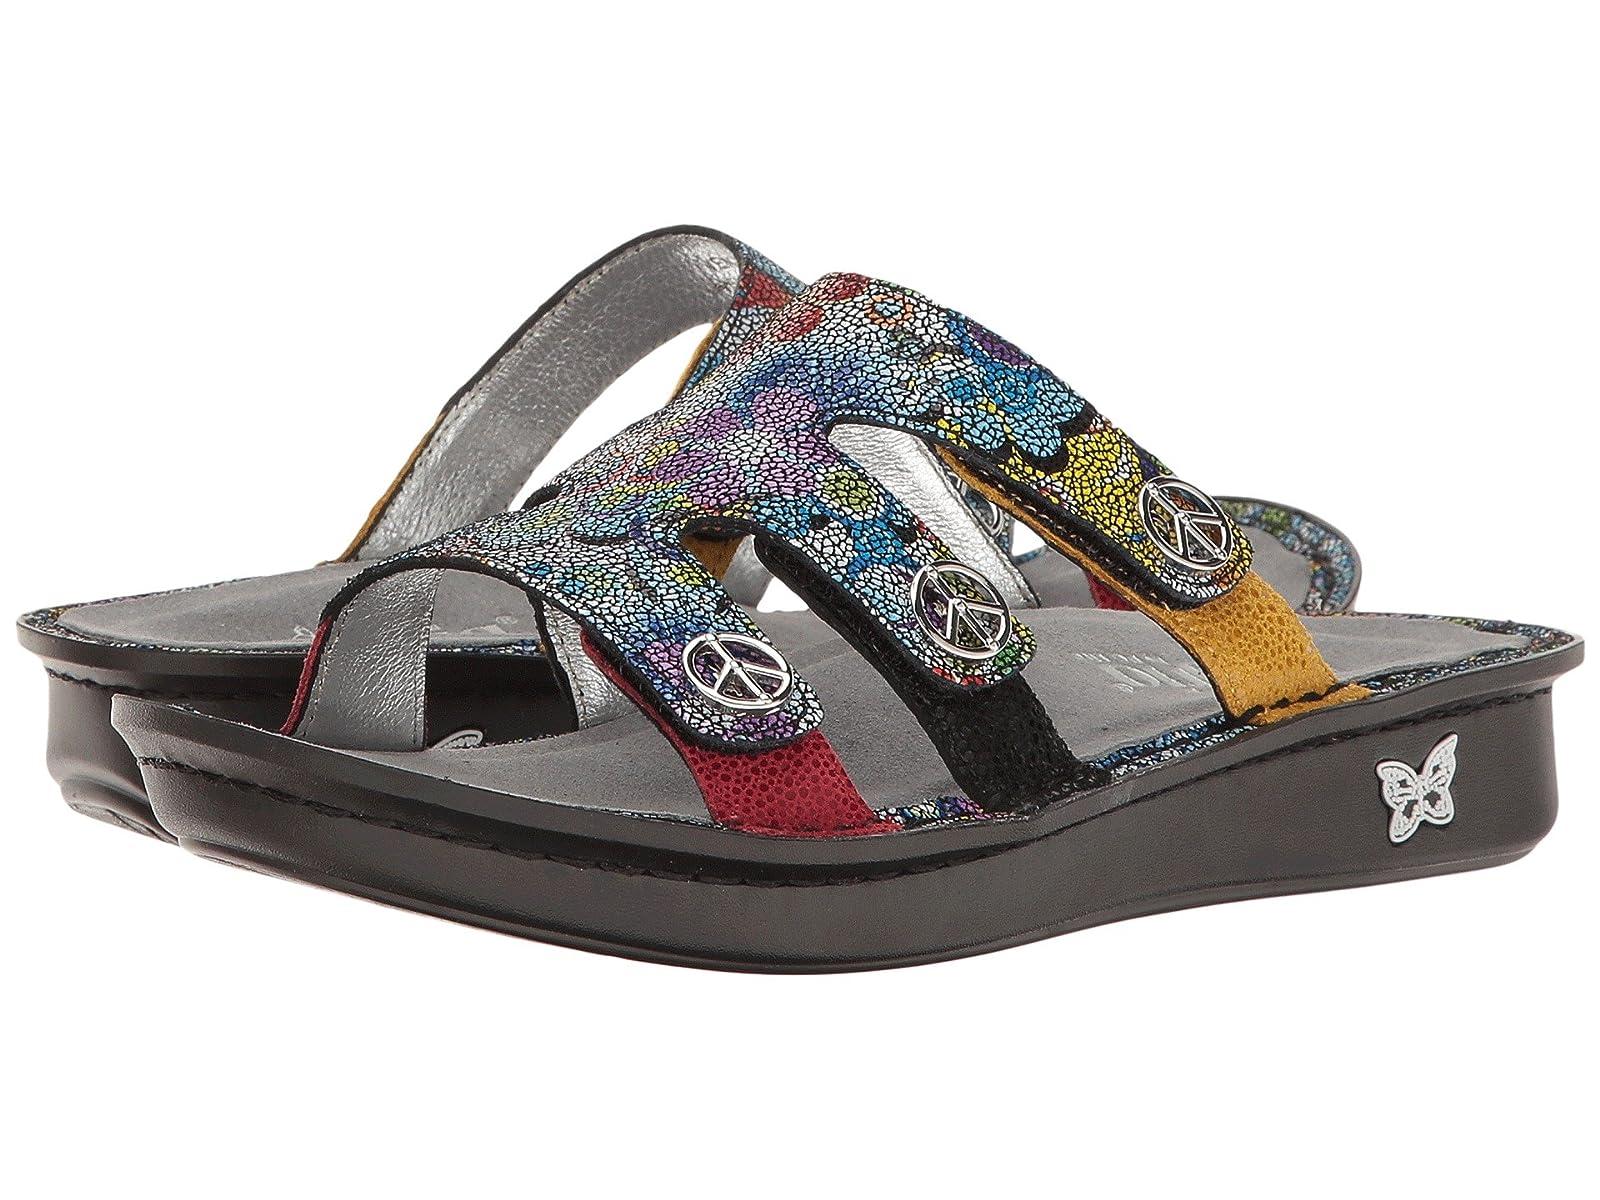 Alegria VeniceAtmospheric grades have affordable shoes